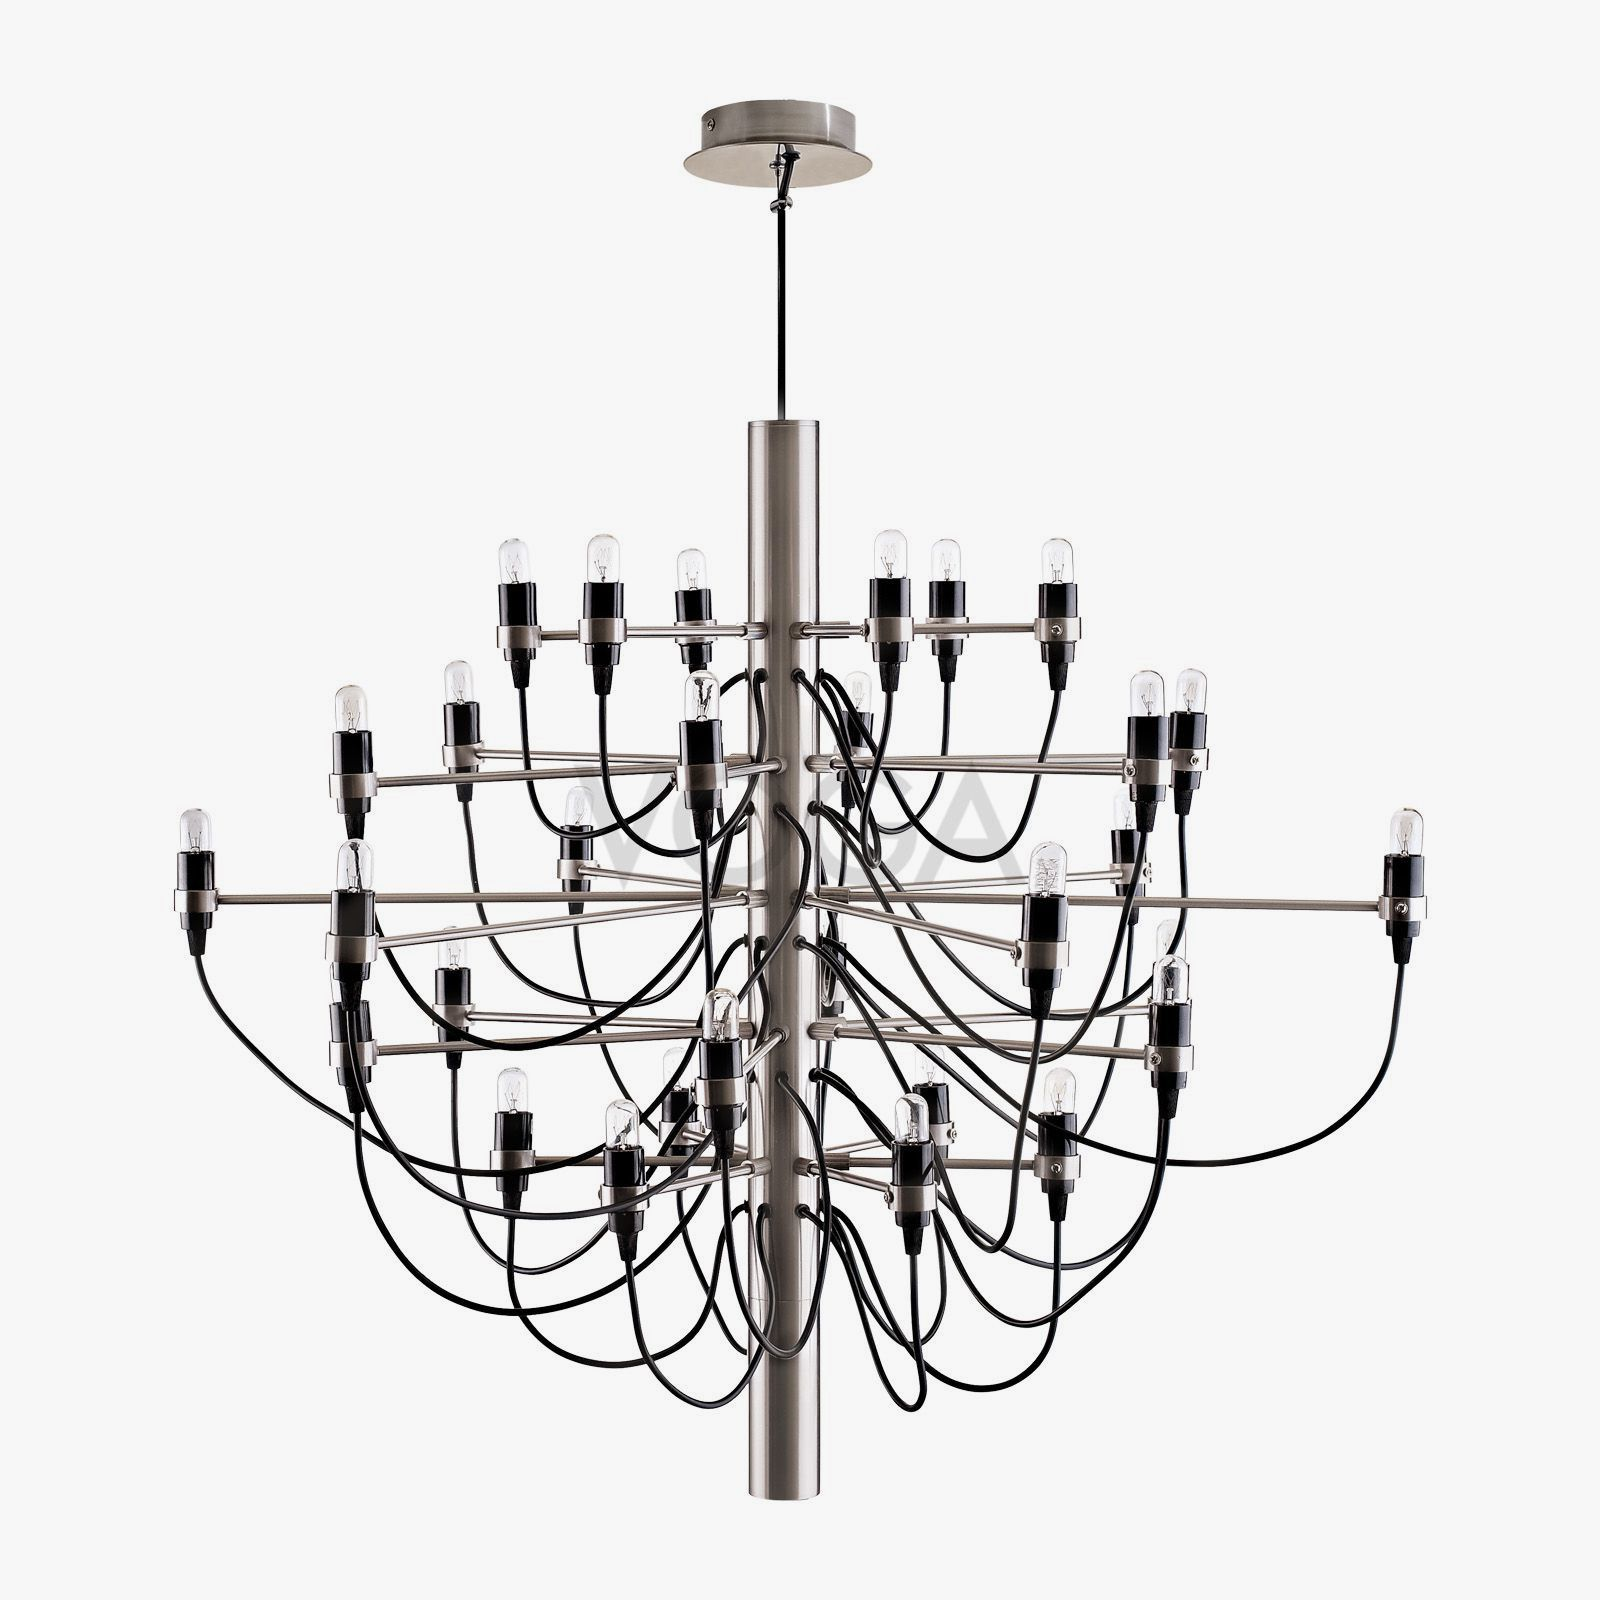 Gino Sarfatti Chandelier | Designer Lamps | VOGA | New home ...